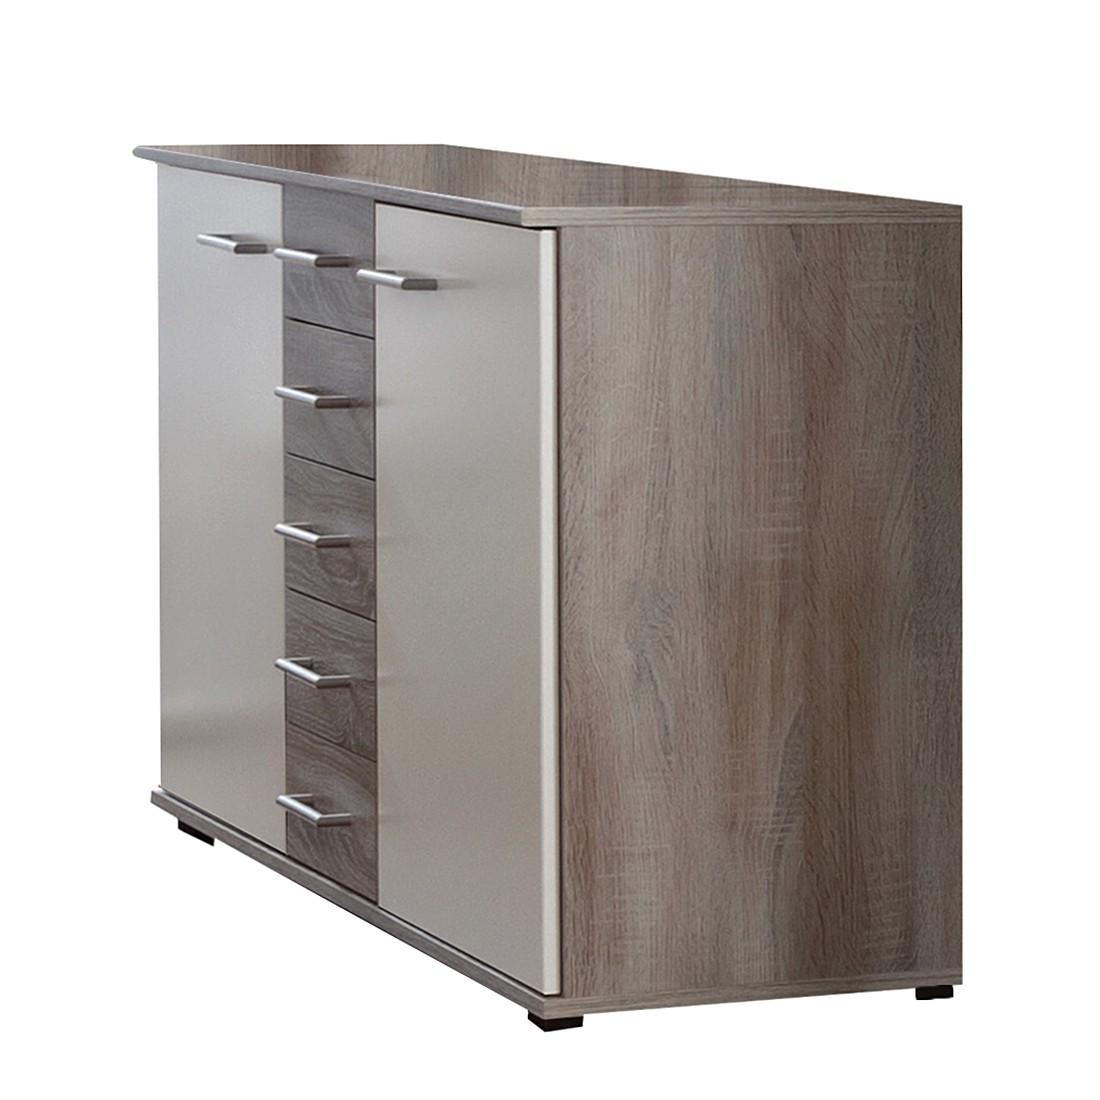 kombikommode tendence montana eiche alpinwei. Black Bedroom Furniture Sets. Home Design Ideas